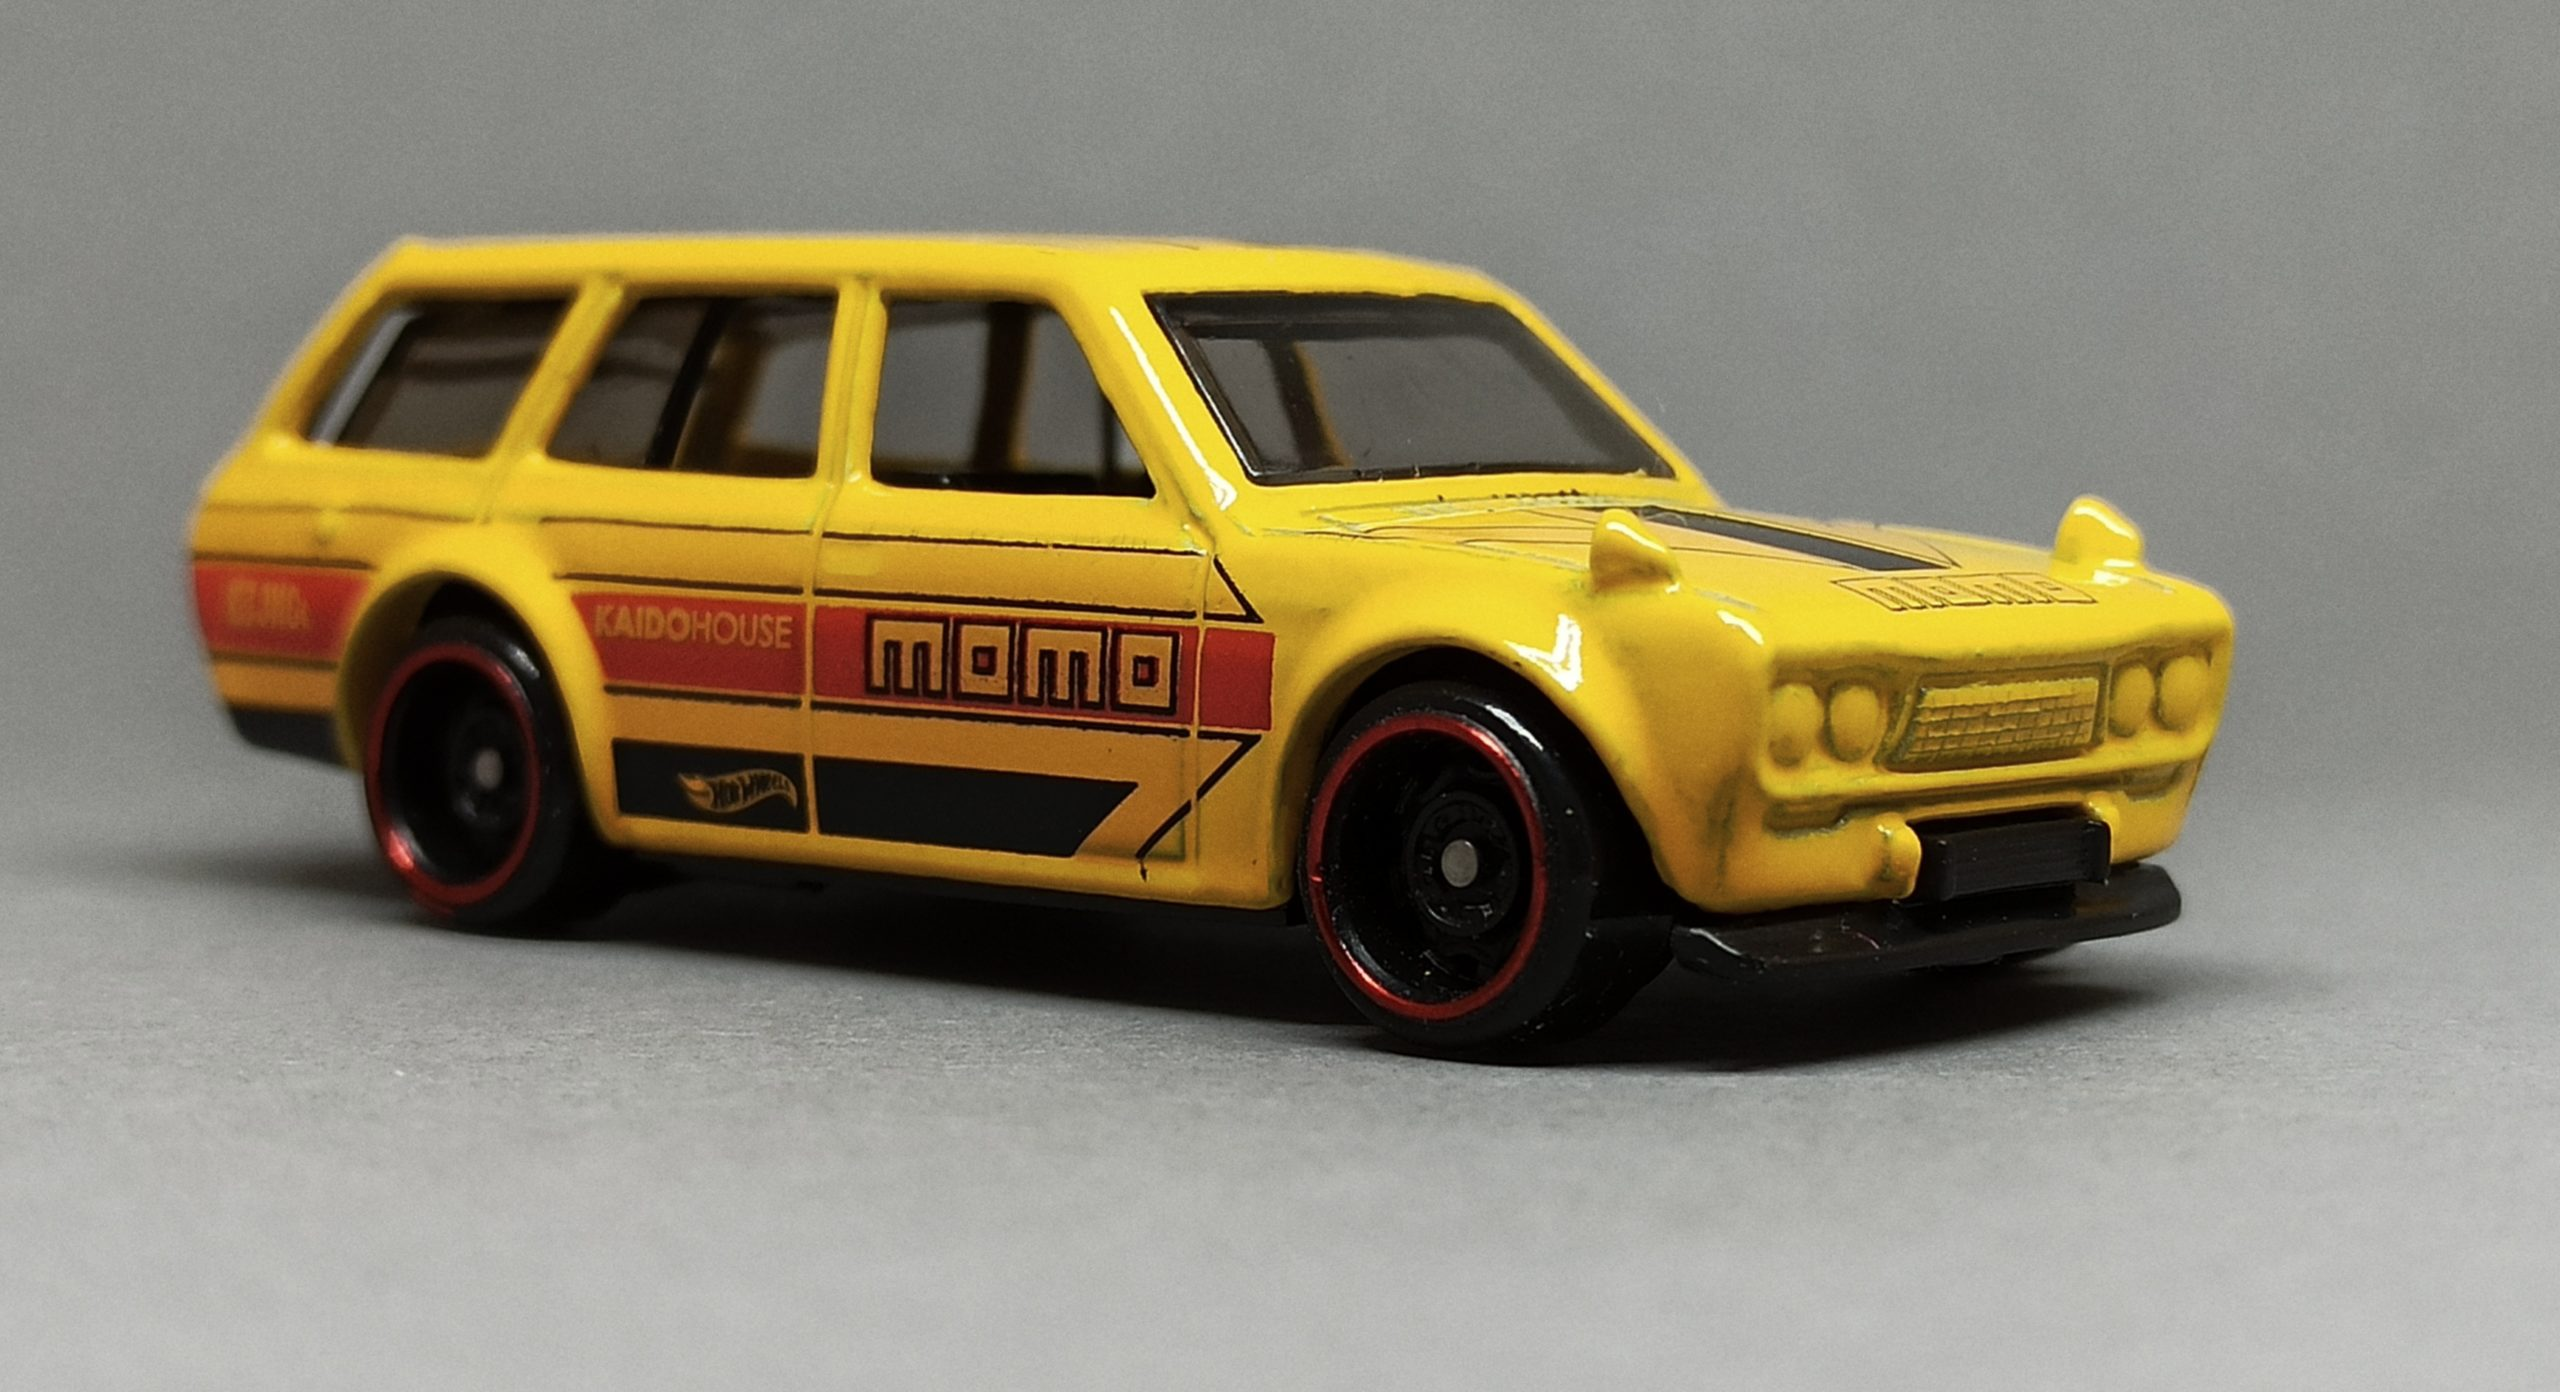 Hot Wheels '71 Datsun Bluebird 510 Wagon (GHG57) 2020 (146/250) HW Speed Graphics (8/10) yellow (Kroger Exclusive) side angle